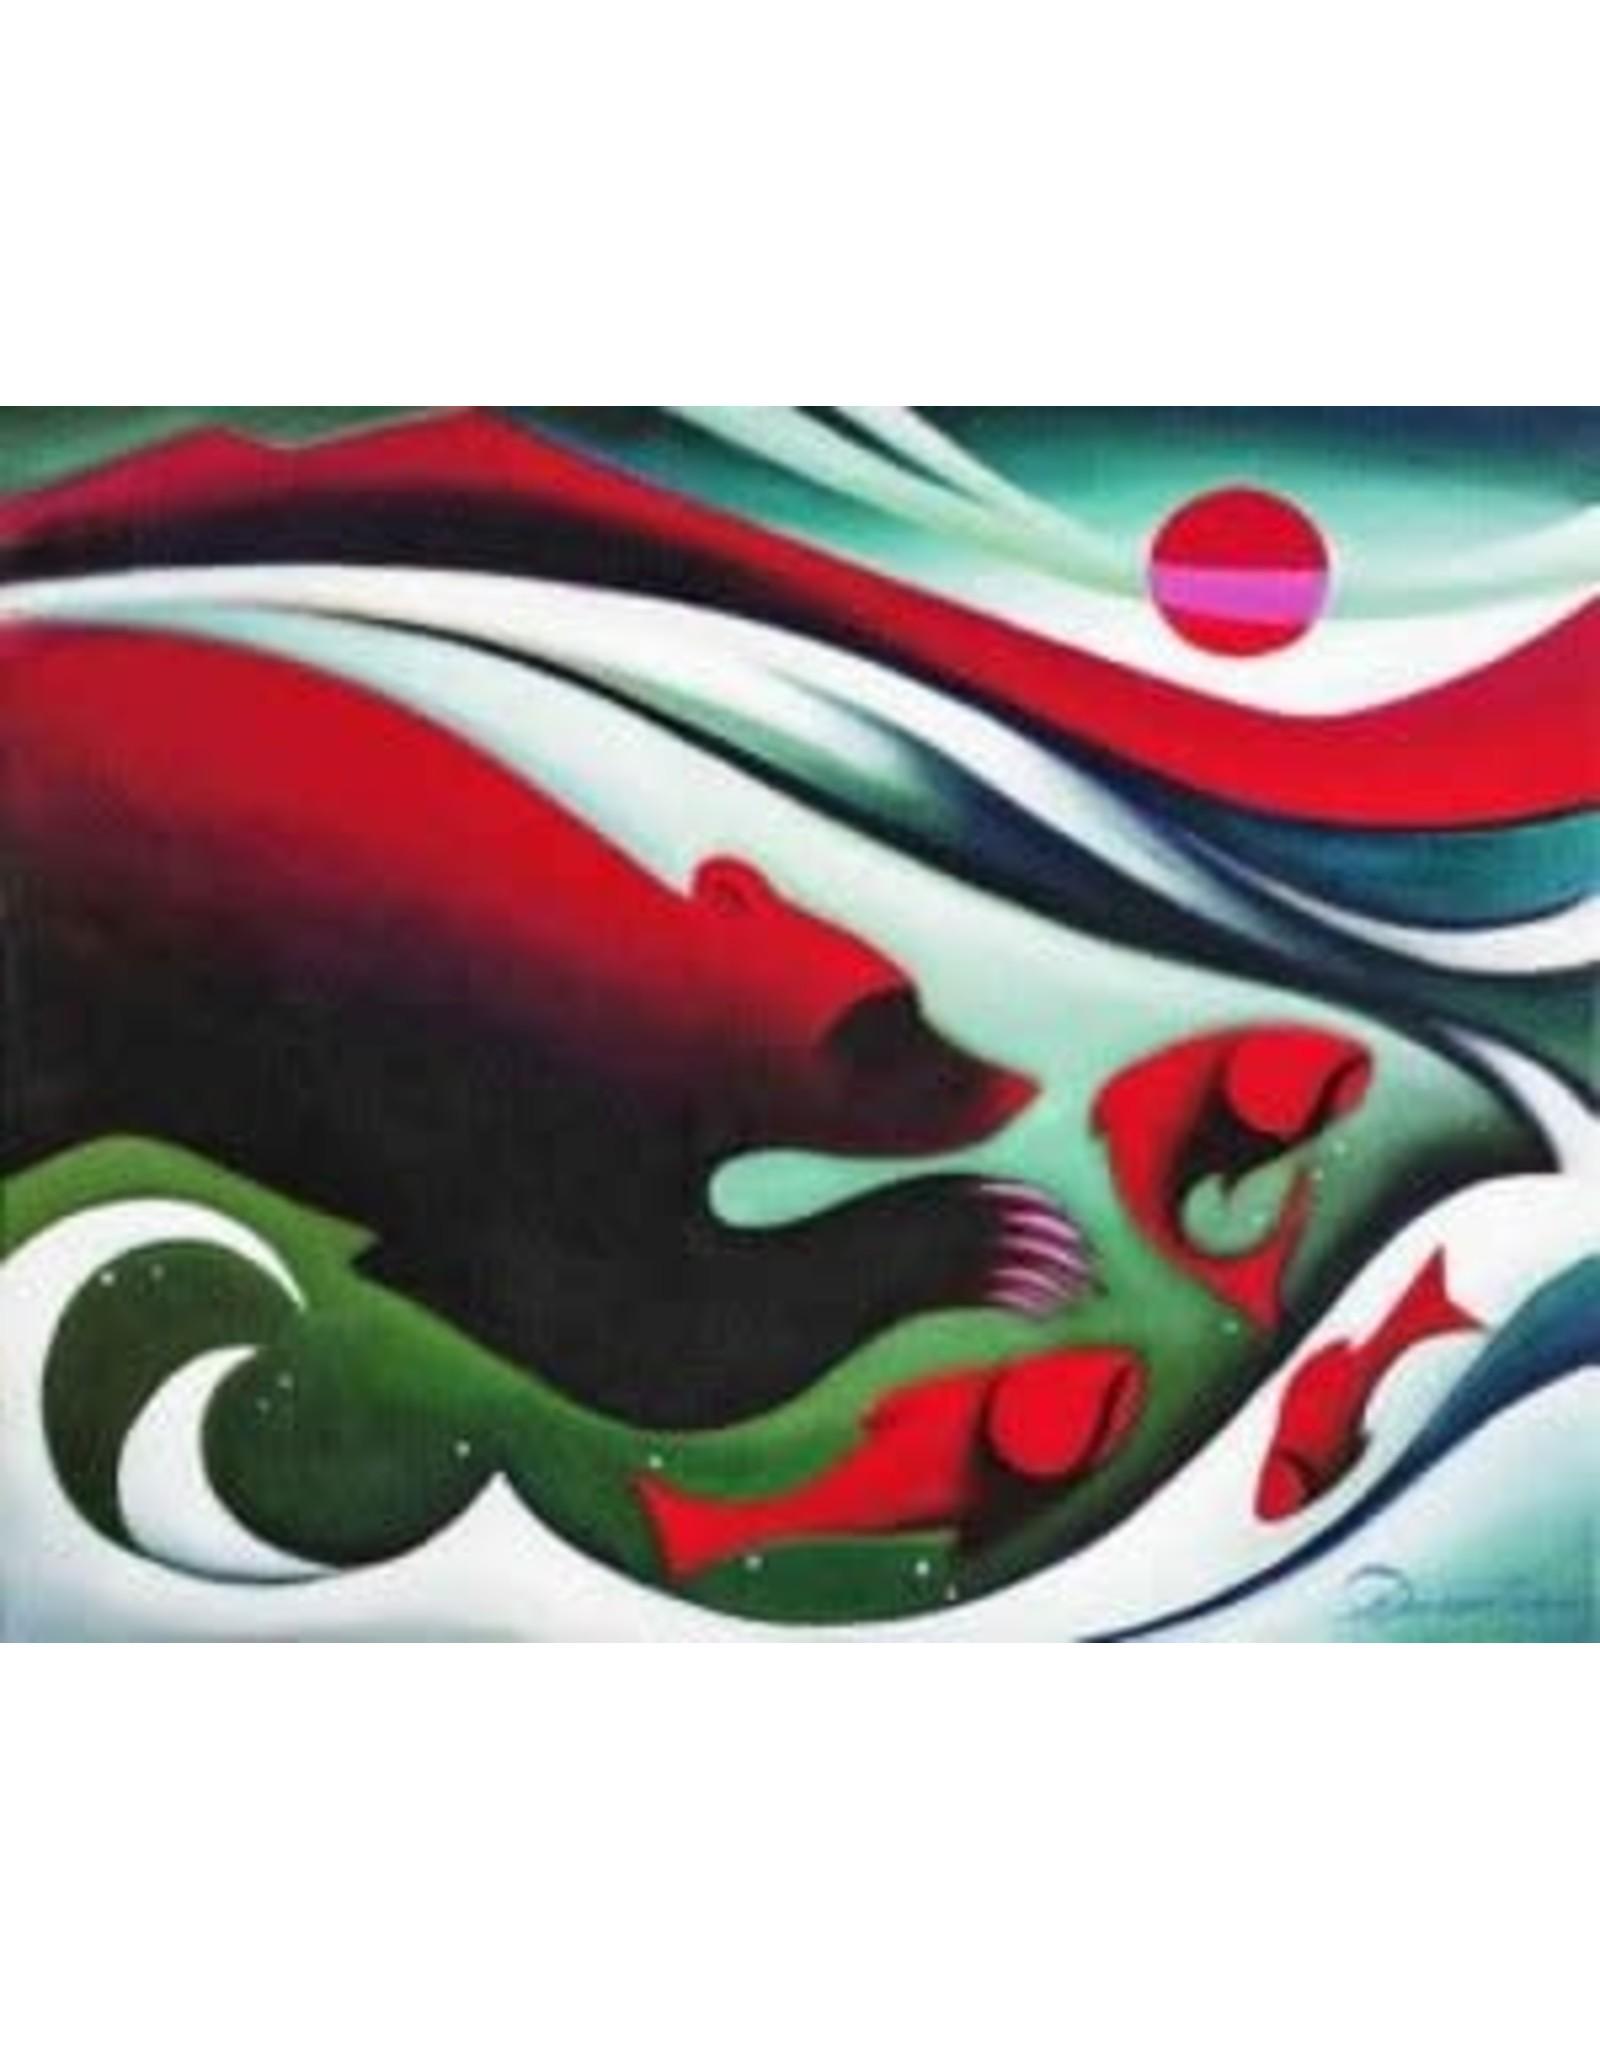 Nathalie Parenteau The Catch (art card) | Nathalie Parenteau